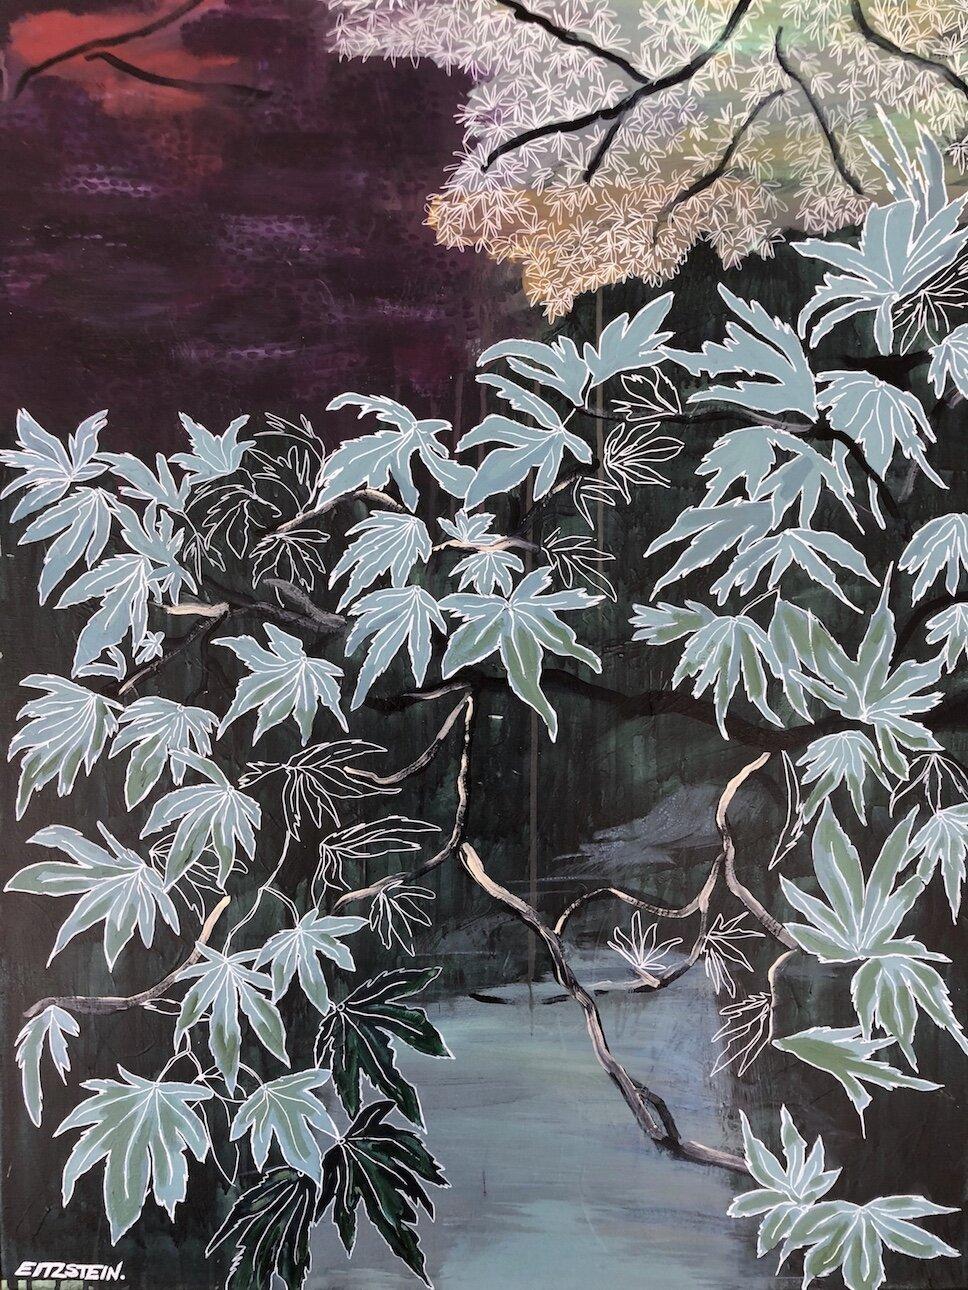 ONE LIFE, ONE ENCOUNTER    Acrylic on linen, framed in raw oak, 76cm x 102cm